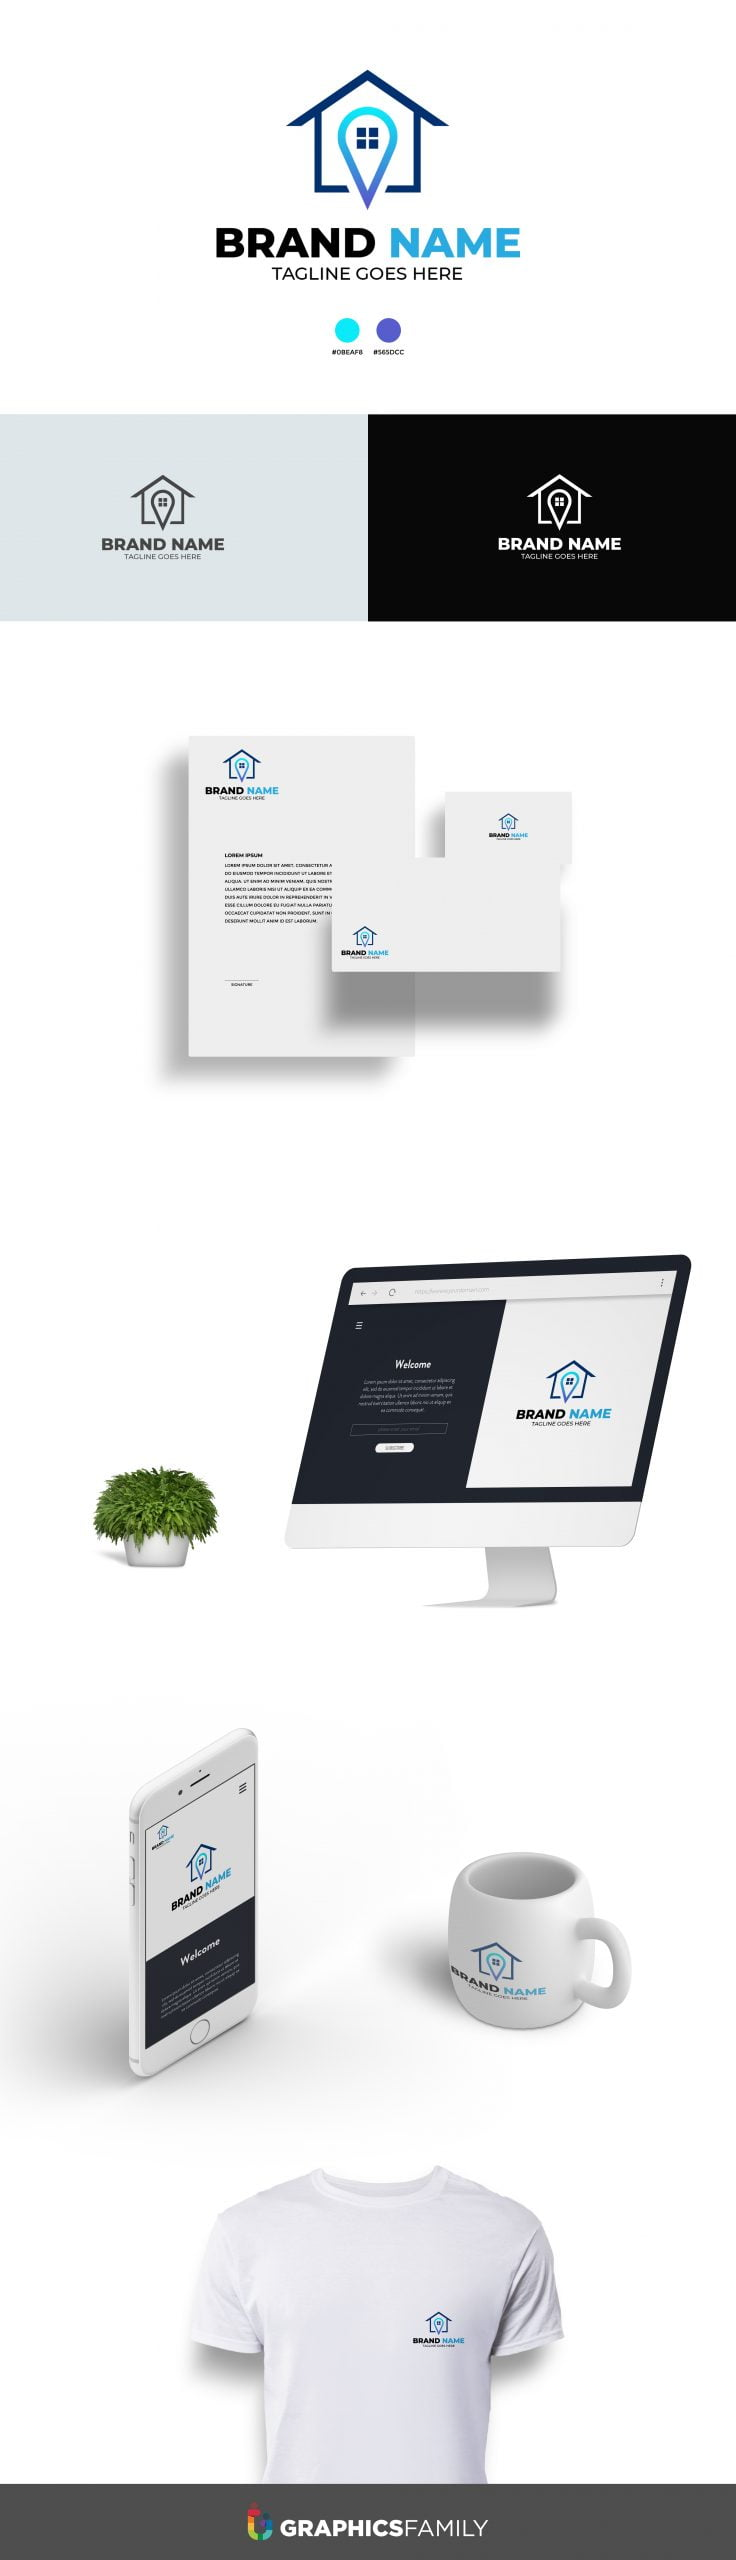 Free Real Estate Logo Vector Download